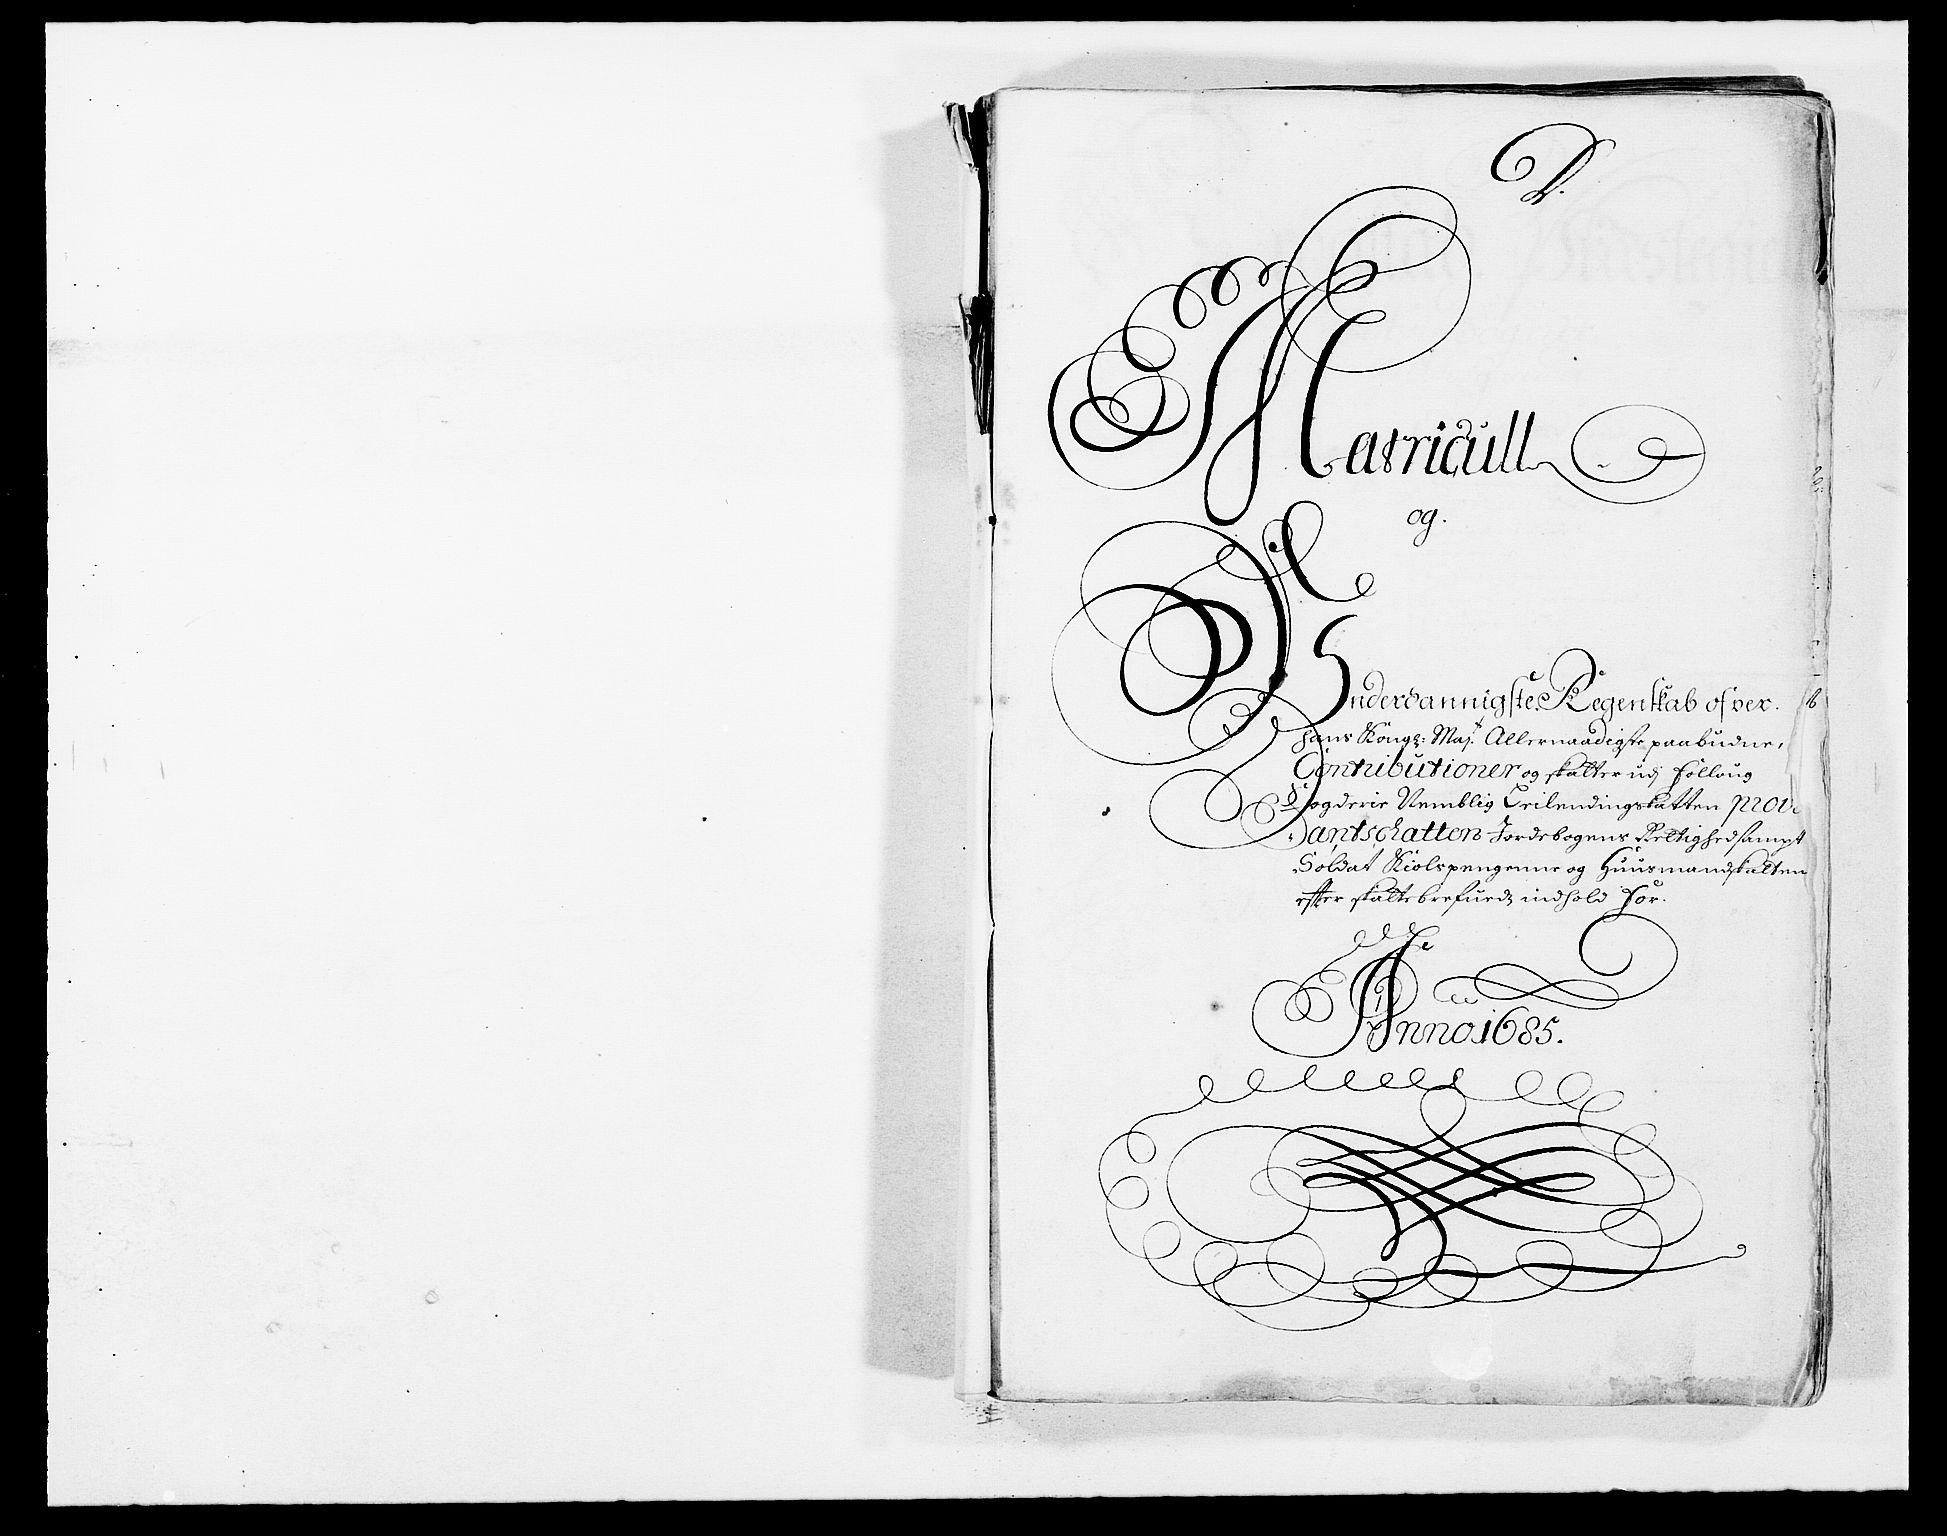 RA, Rentekammeret inntil 1814, Reviderte regnskaper, Fogderegnskap, R09/L0433: Fogderegnskap Follo, 1685-1686, s. 11